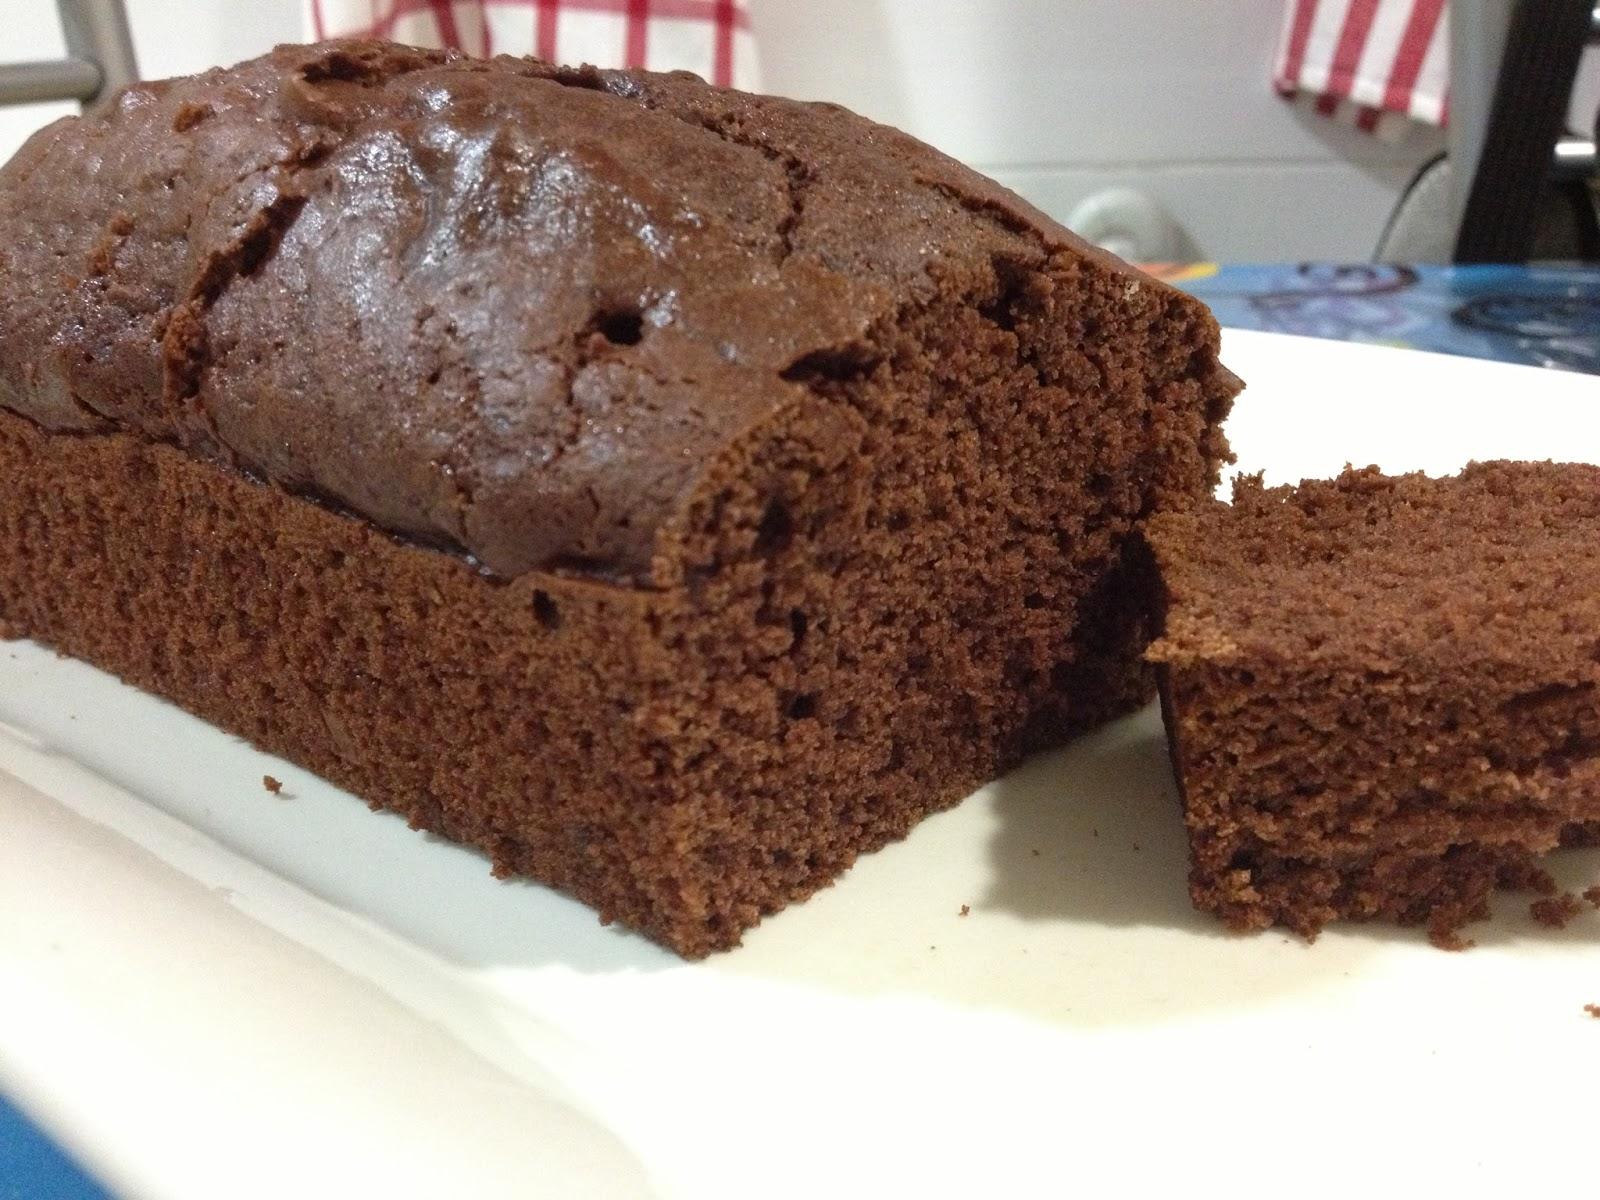 Cocinando con mellizos bizcocho de chocolate sin gluten - Comprar thermomix corte ingles ...